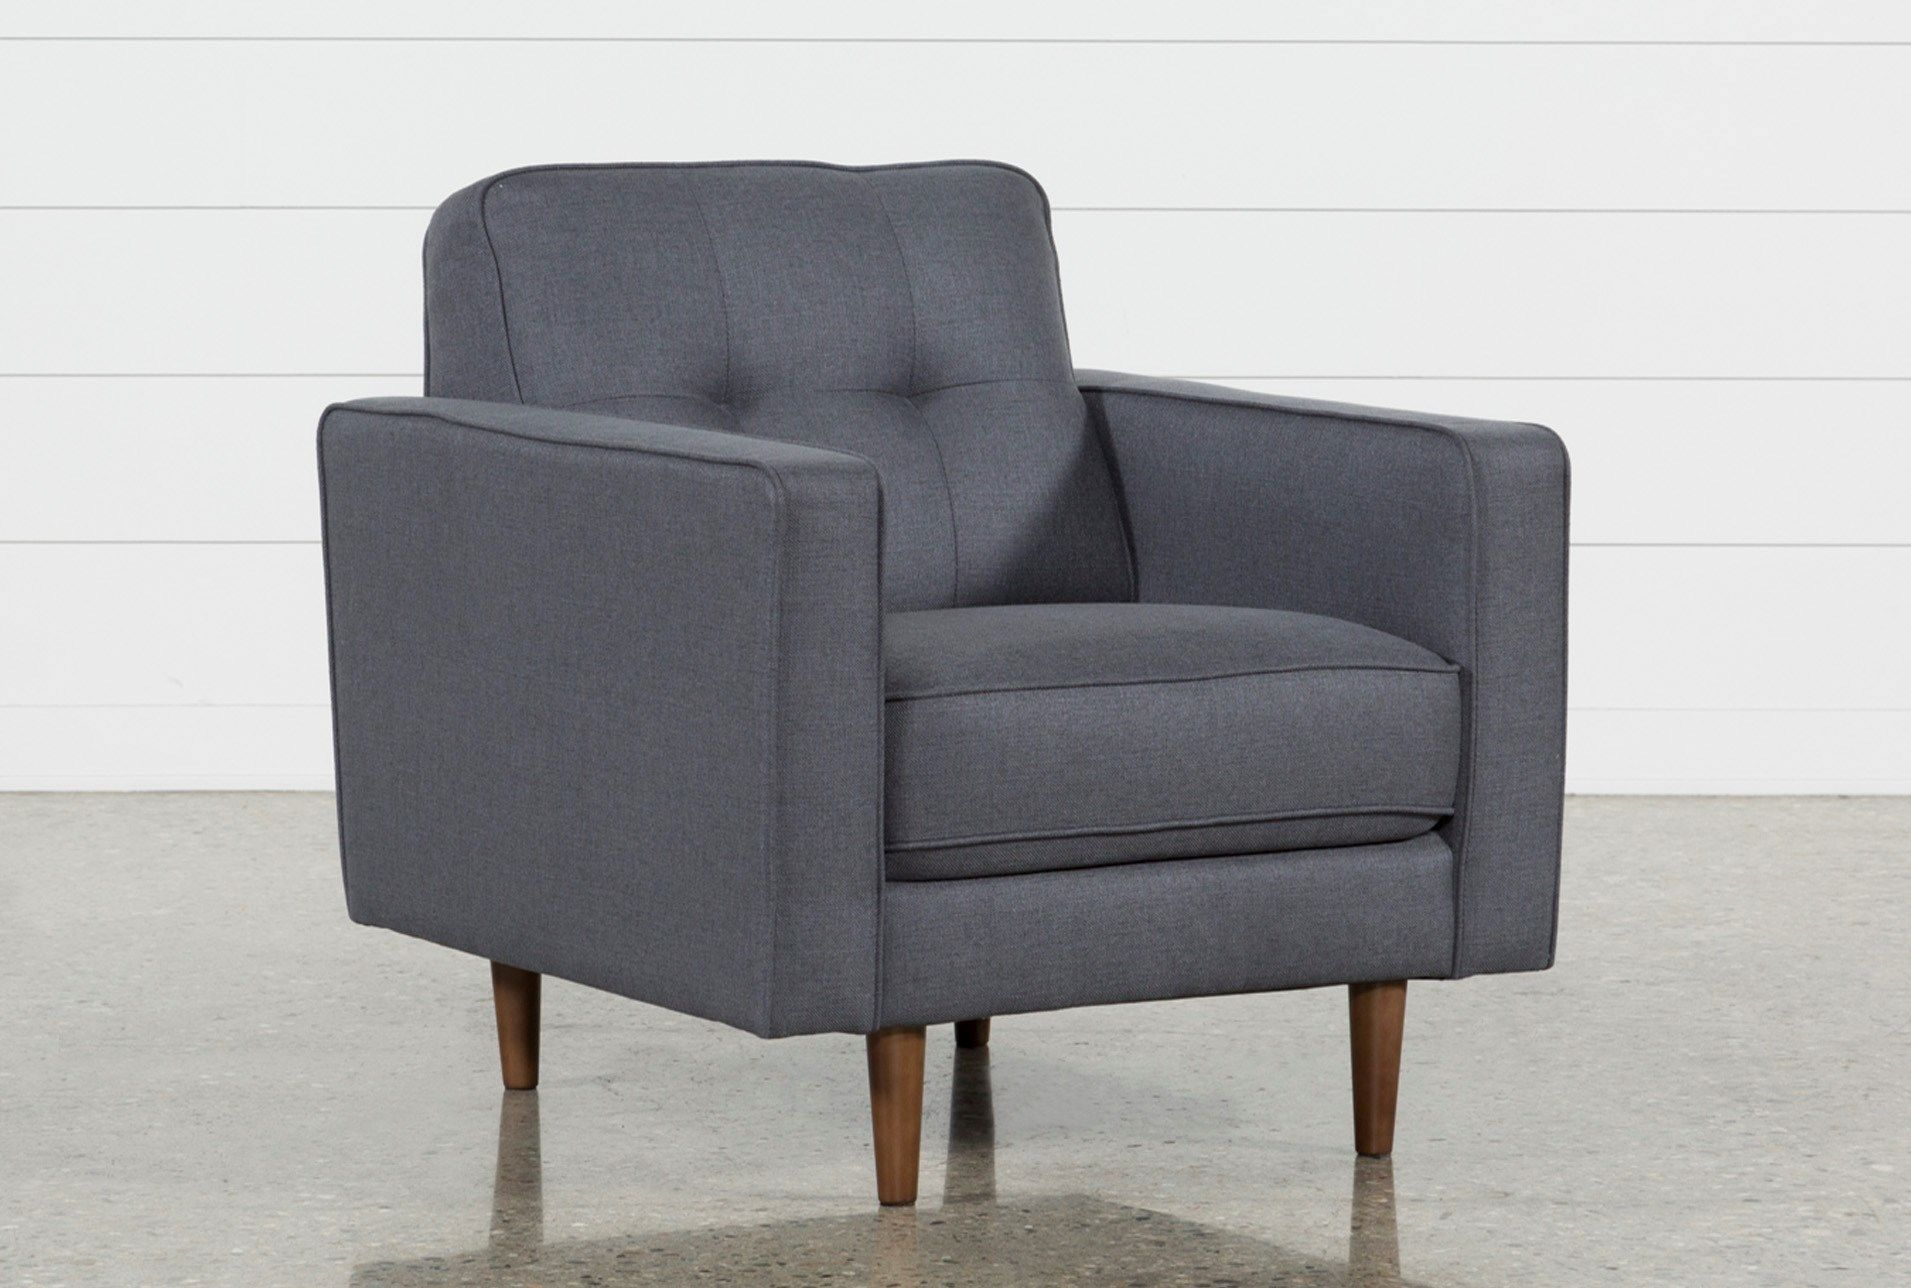 London Dark Grey Chair High Back Accent Chairs Grey Chair